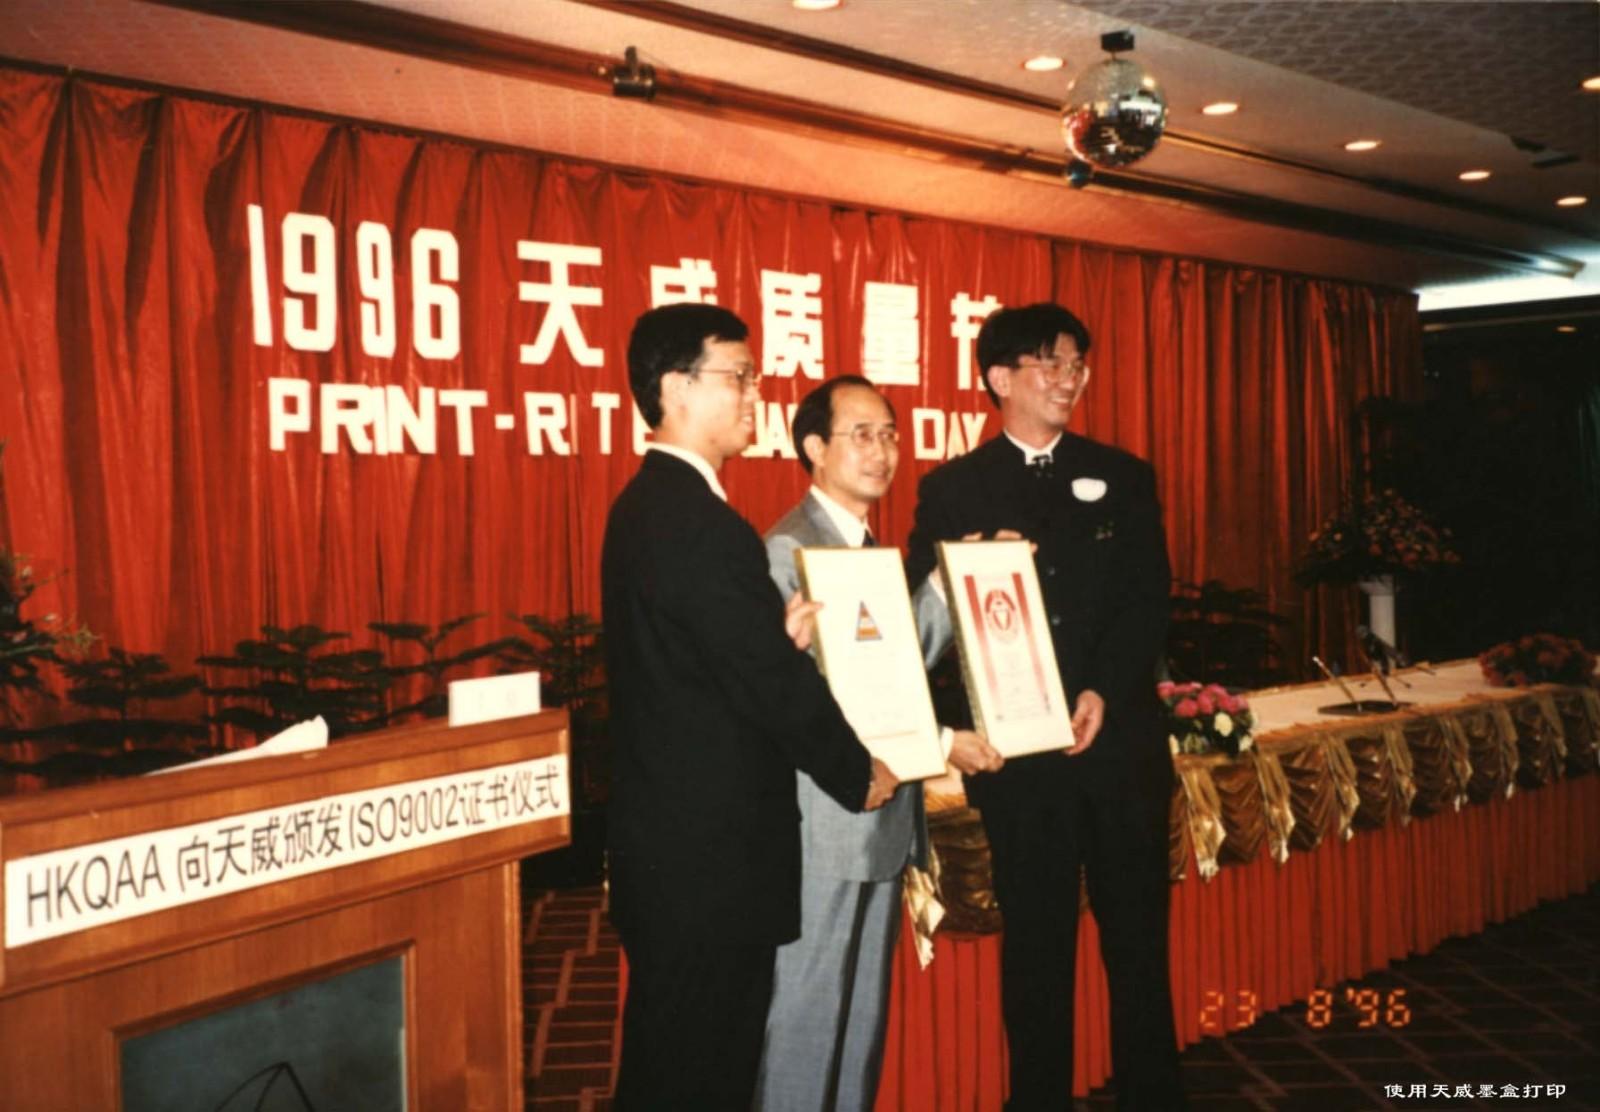 1996 获得ISO9002 认证.jpg